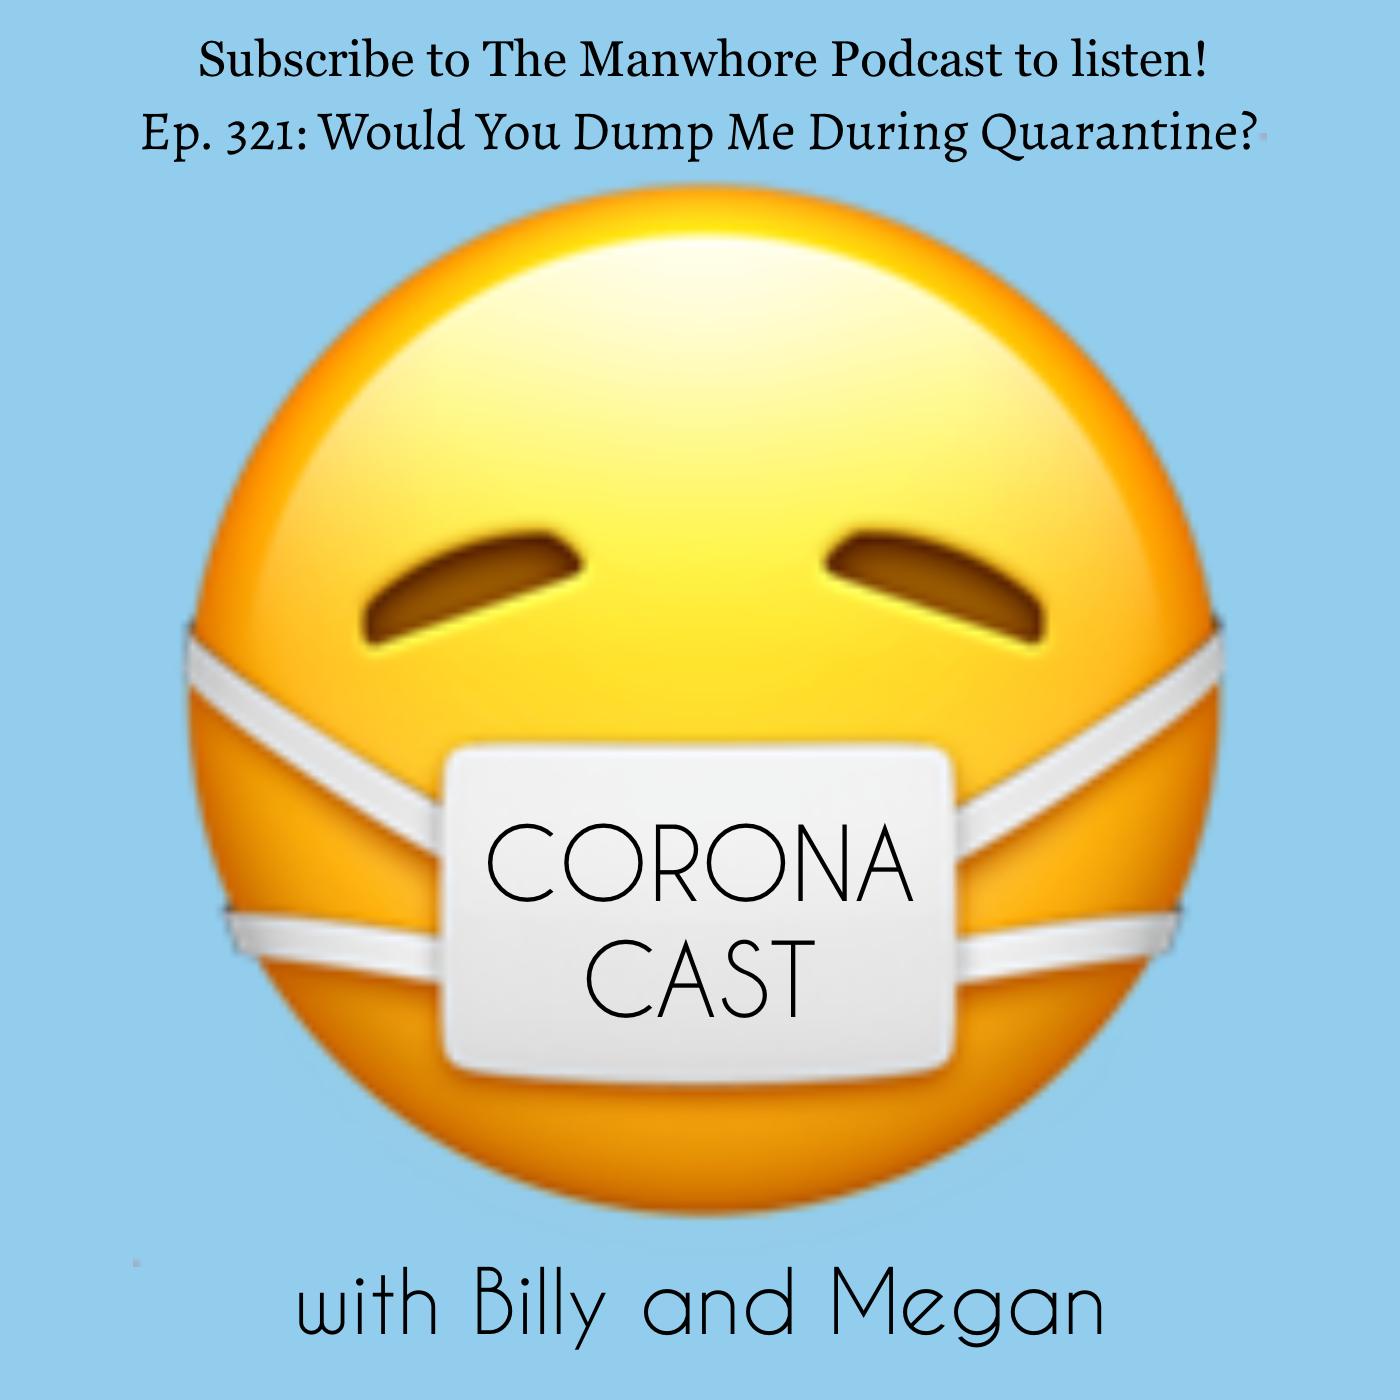 The Manwhore Podcast: A Sex-Positive Quest - Ep. 321: Corona Cast Part 6 - Would You Dump Me During Quarantine?